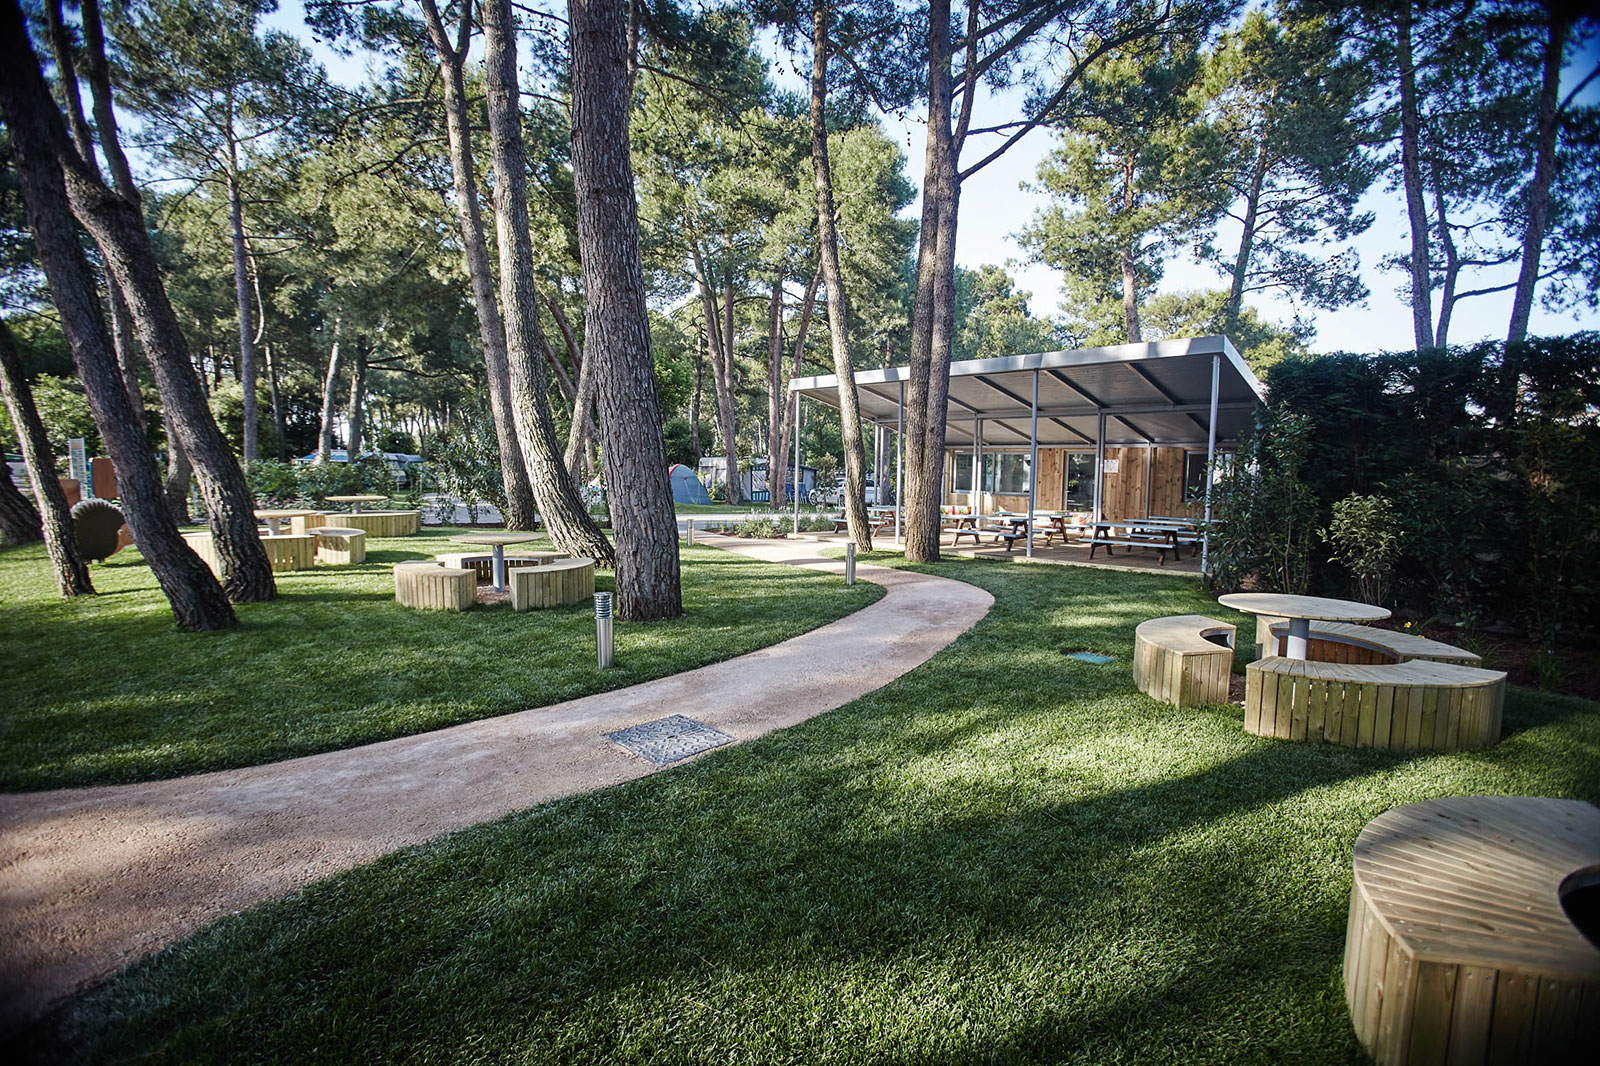 Kinderurlaub-an-der-Adria-in-Jesolo-Cavallino